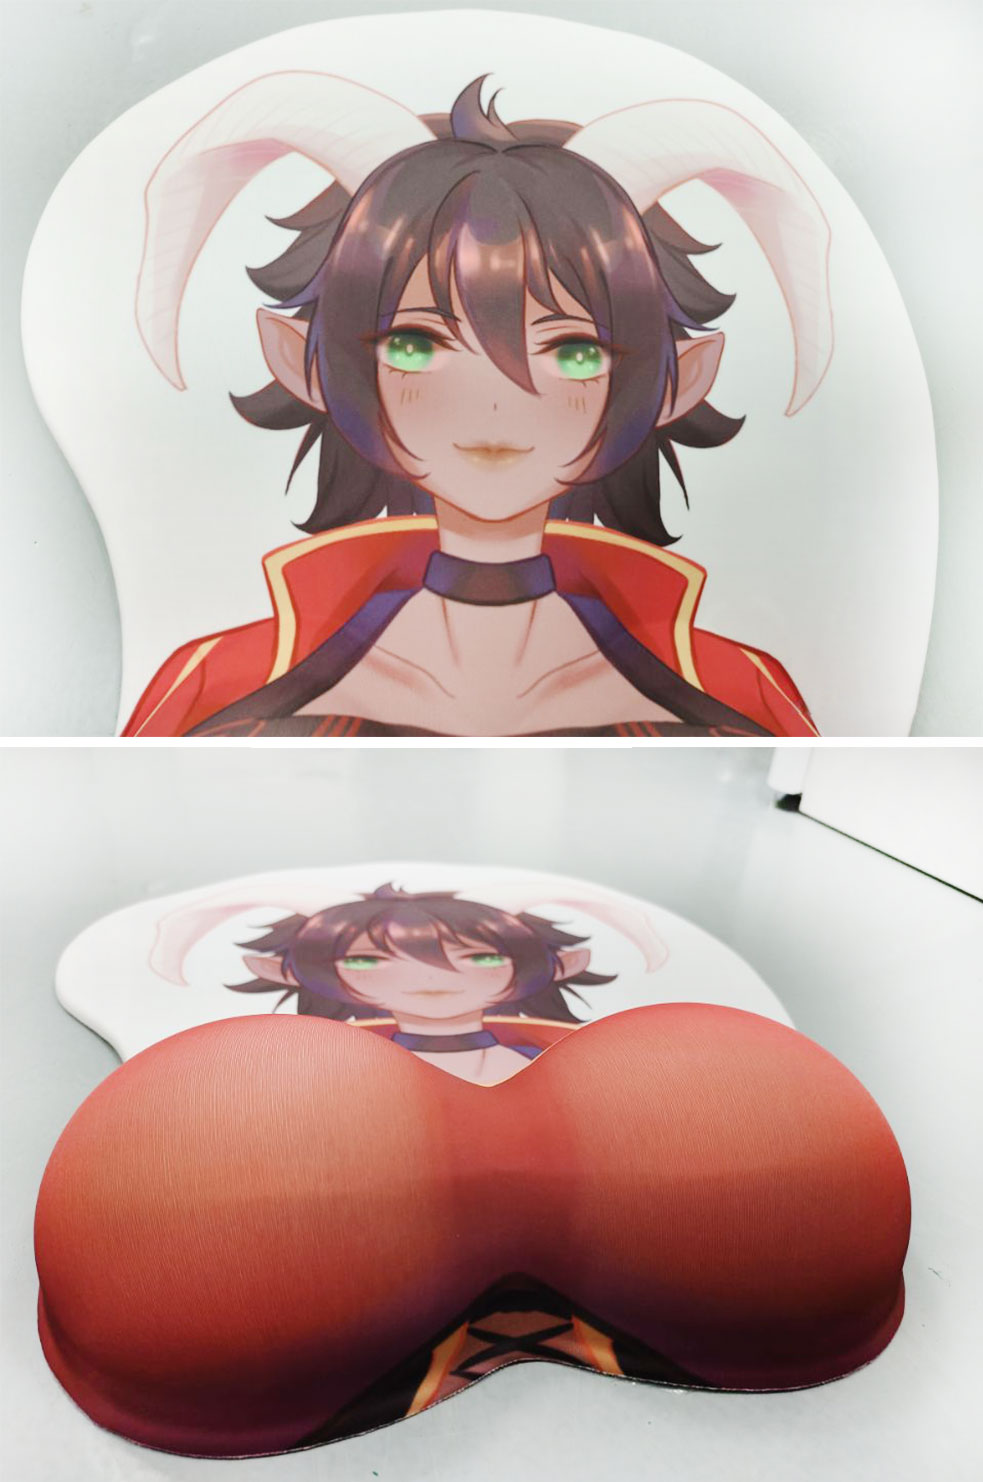 mitsuri kanroji life size oppai mousepad 3432 - Anime Mousepads